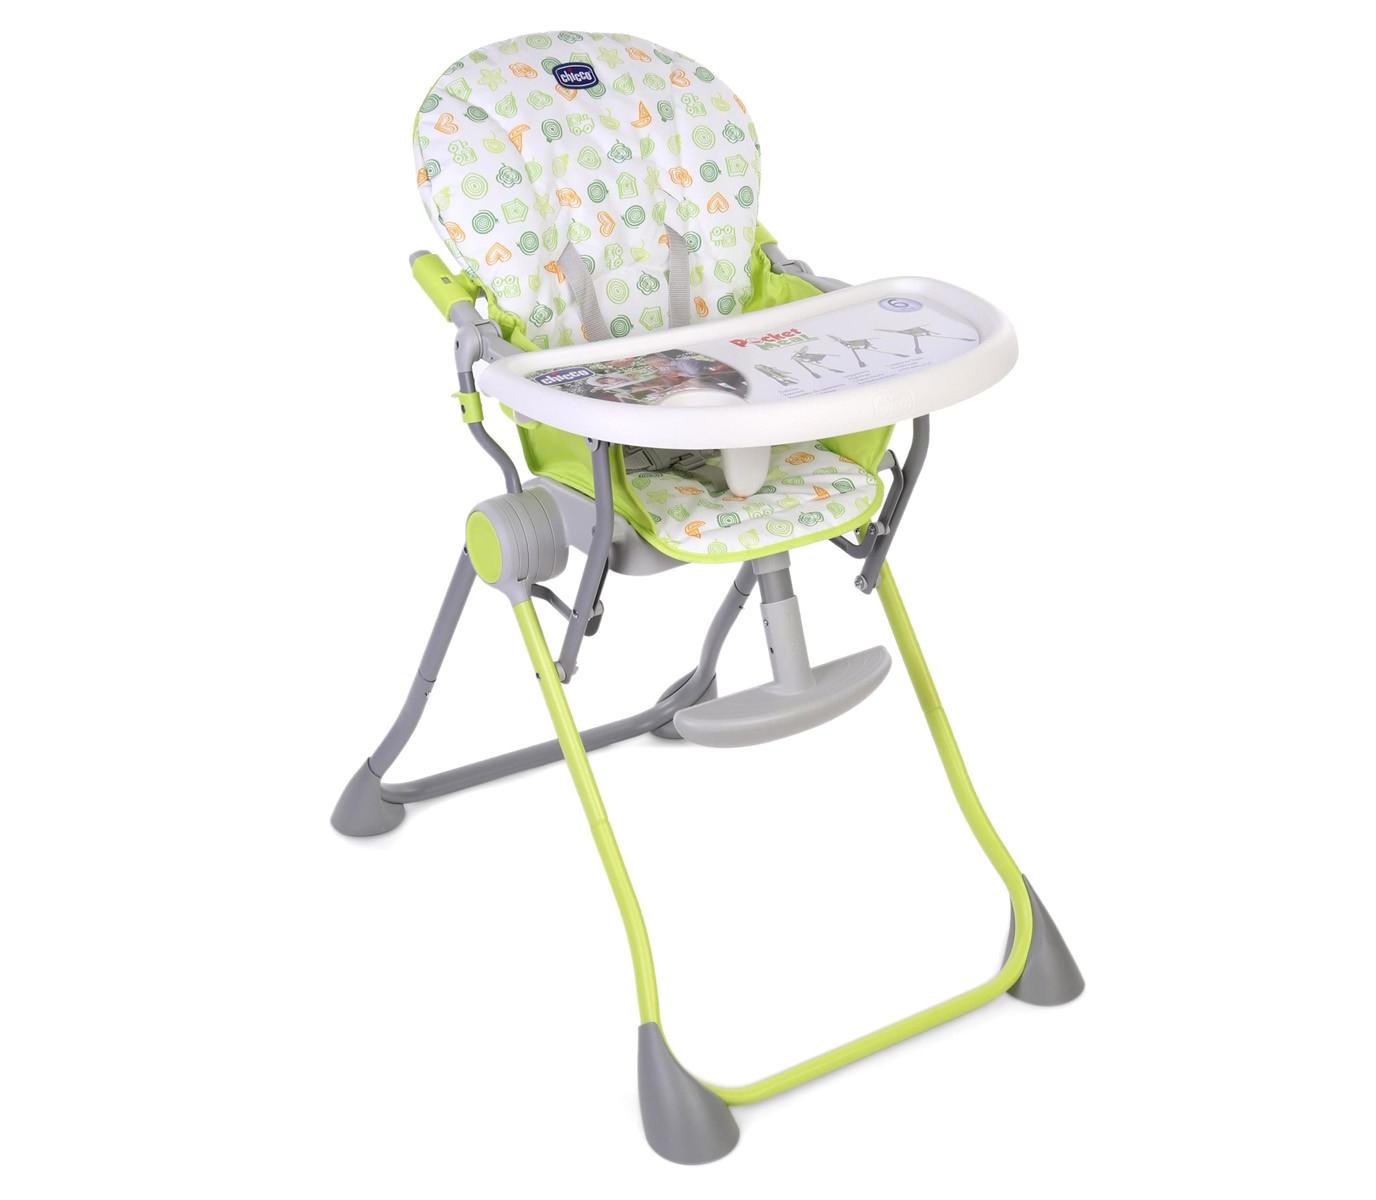 Astounding Evenflo Compact Fold High Chair Lima Chicco Pocket Meal High Machost Co Dining Chair Design Ideas Machostcouk